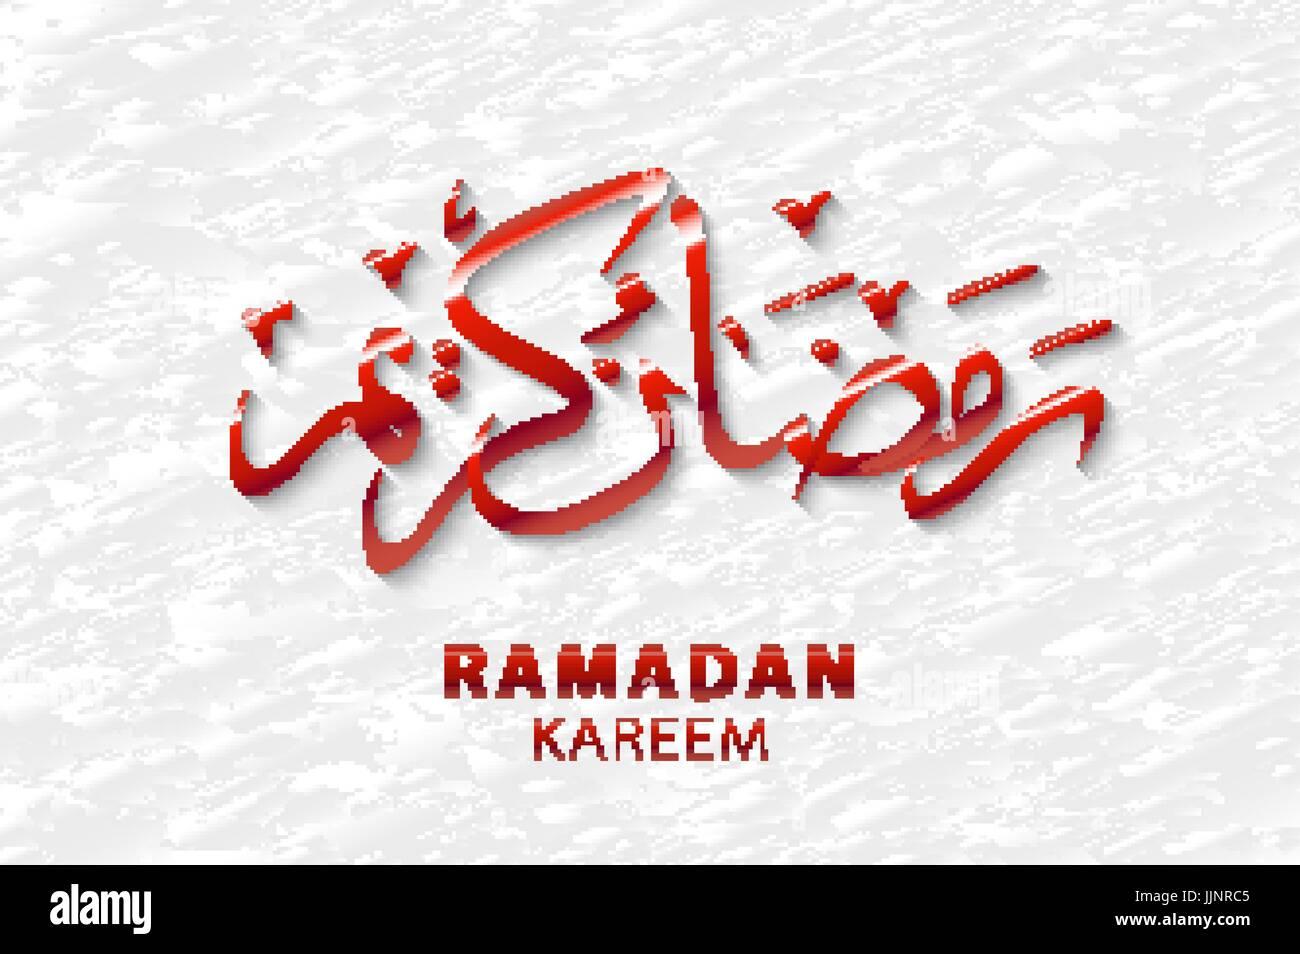 Ramadan greetings in arabic script an islamic greeting card for ramadan greetings in arabic script an islamic greeting card for holy month of ramadan kareem translation generous ramadhan art m4hsunfo